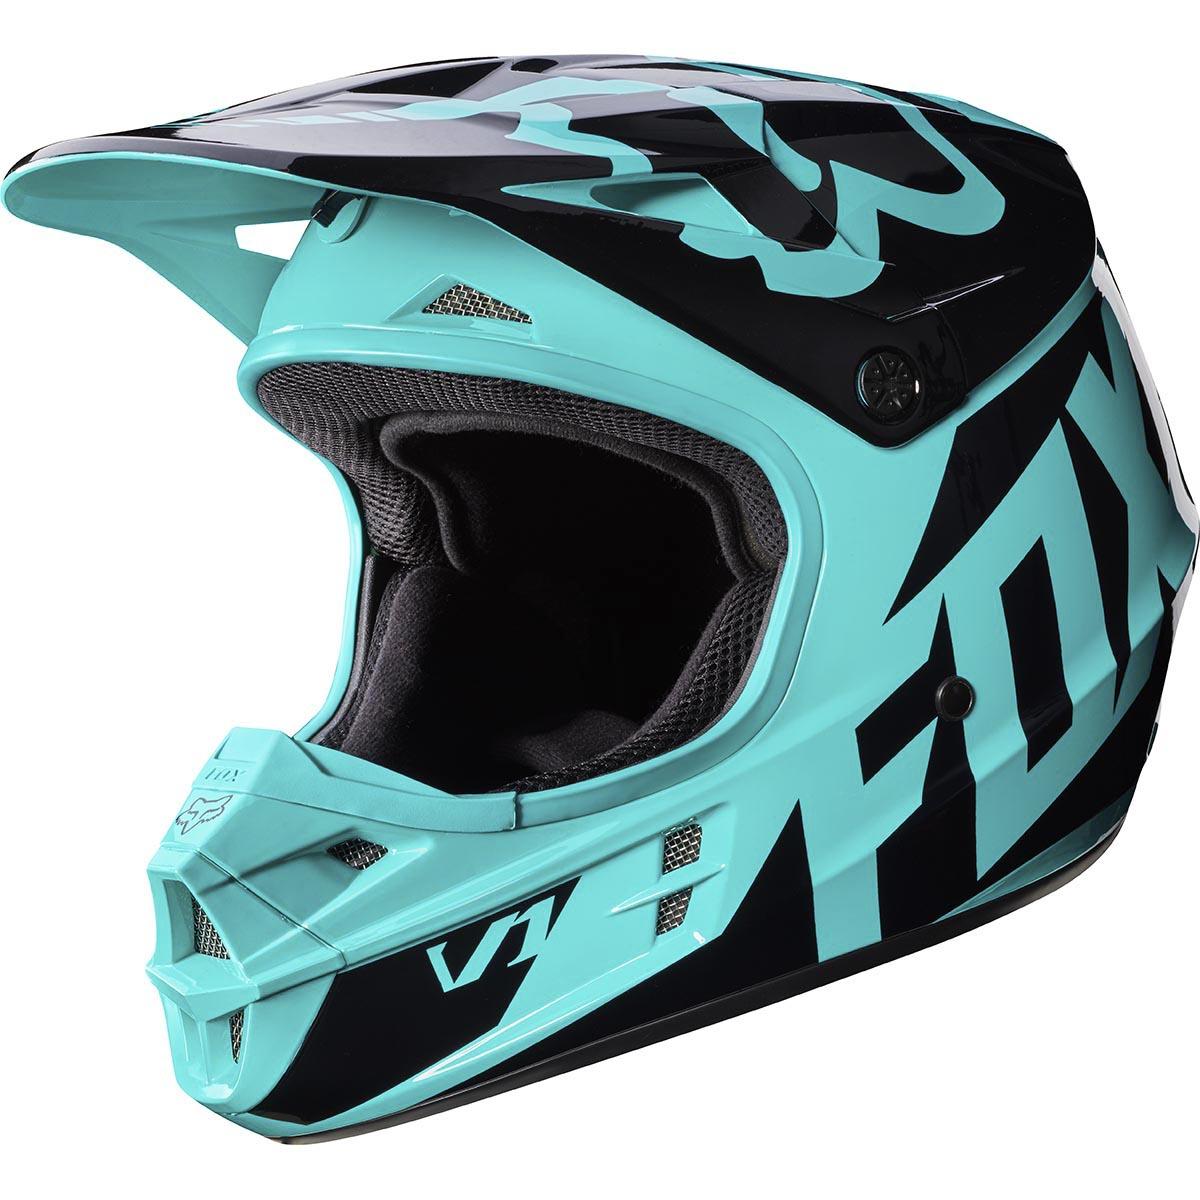 Fox - 2017 V1 Race шлем, зеленый